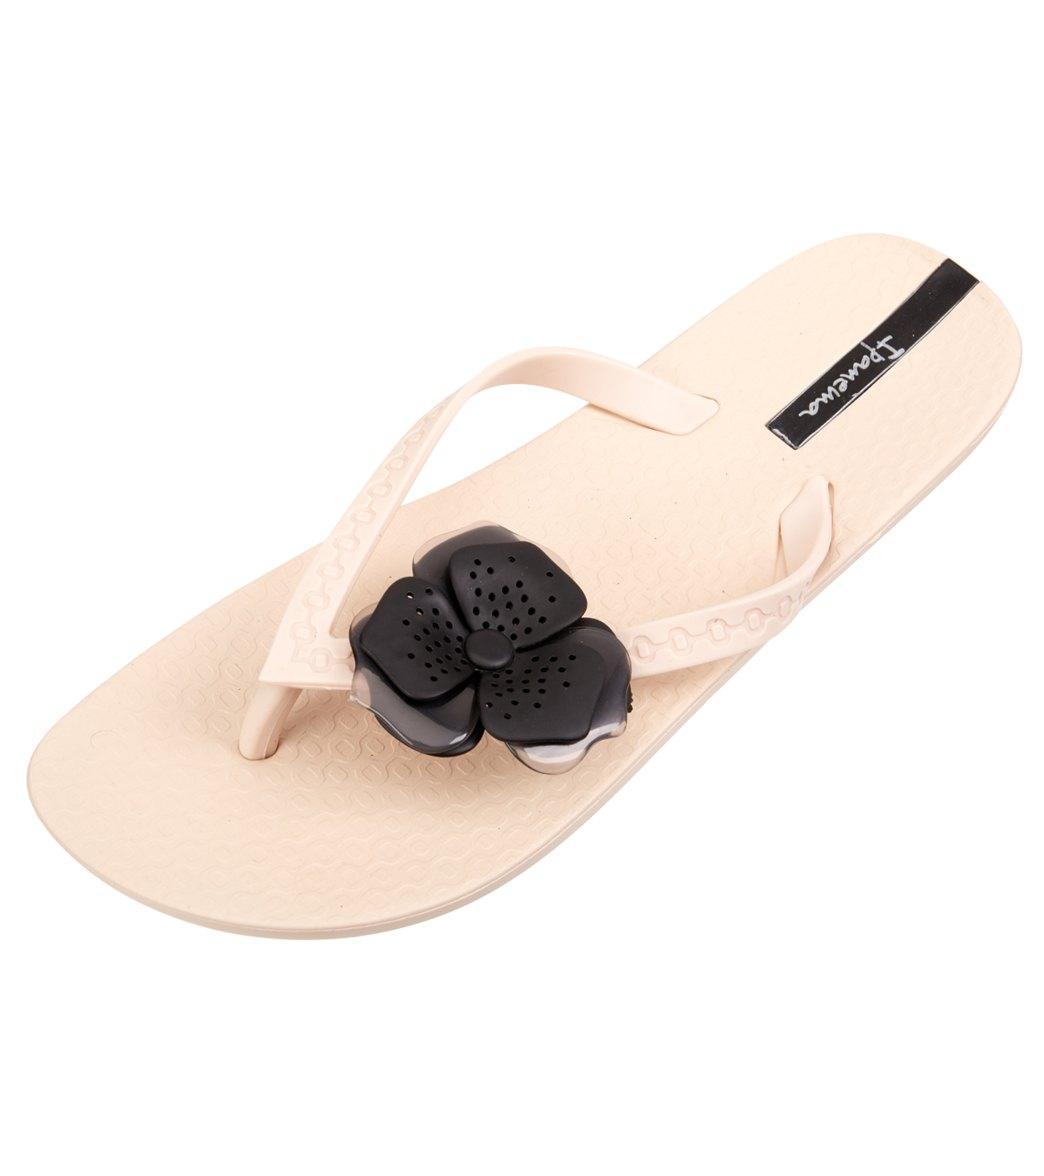 a8c244dac64 Ipanema Women's Neo Petal Flip Flop at SwimOutlet.com